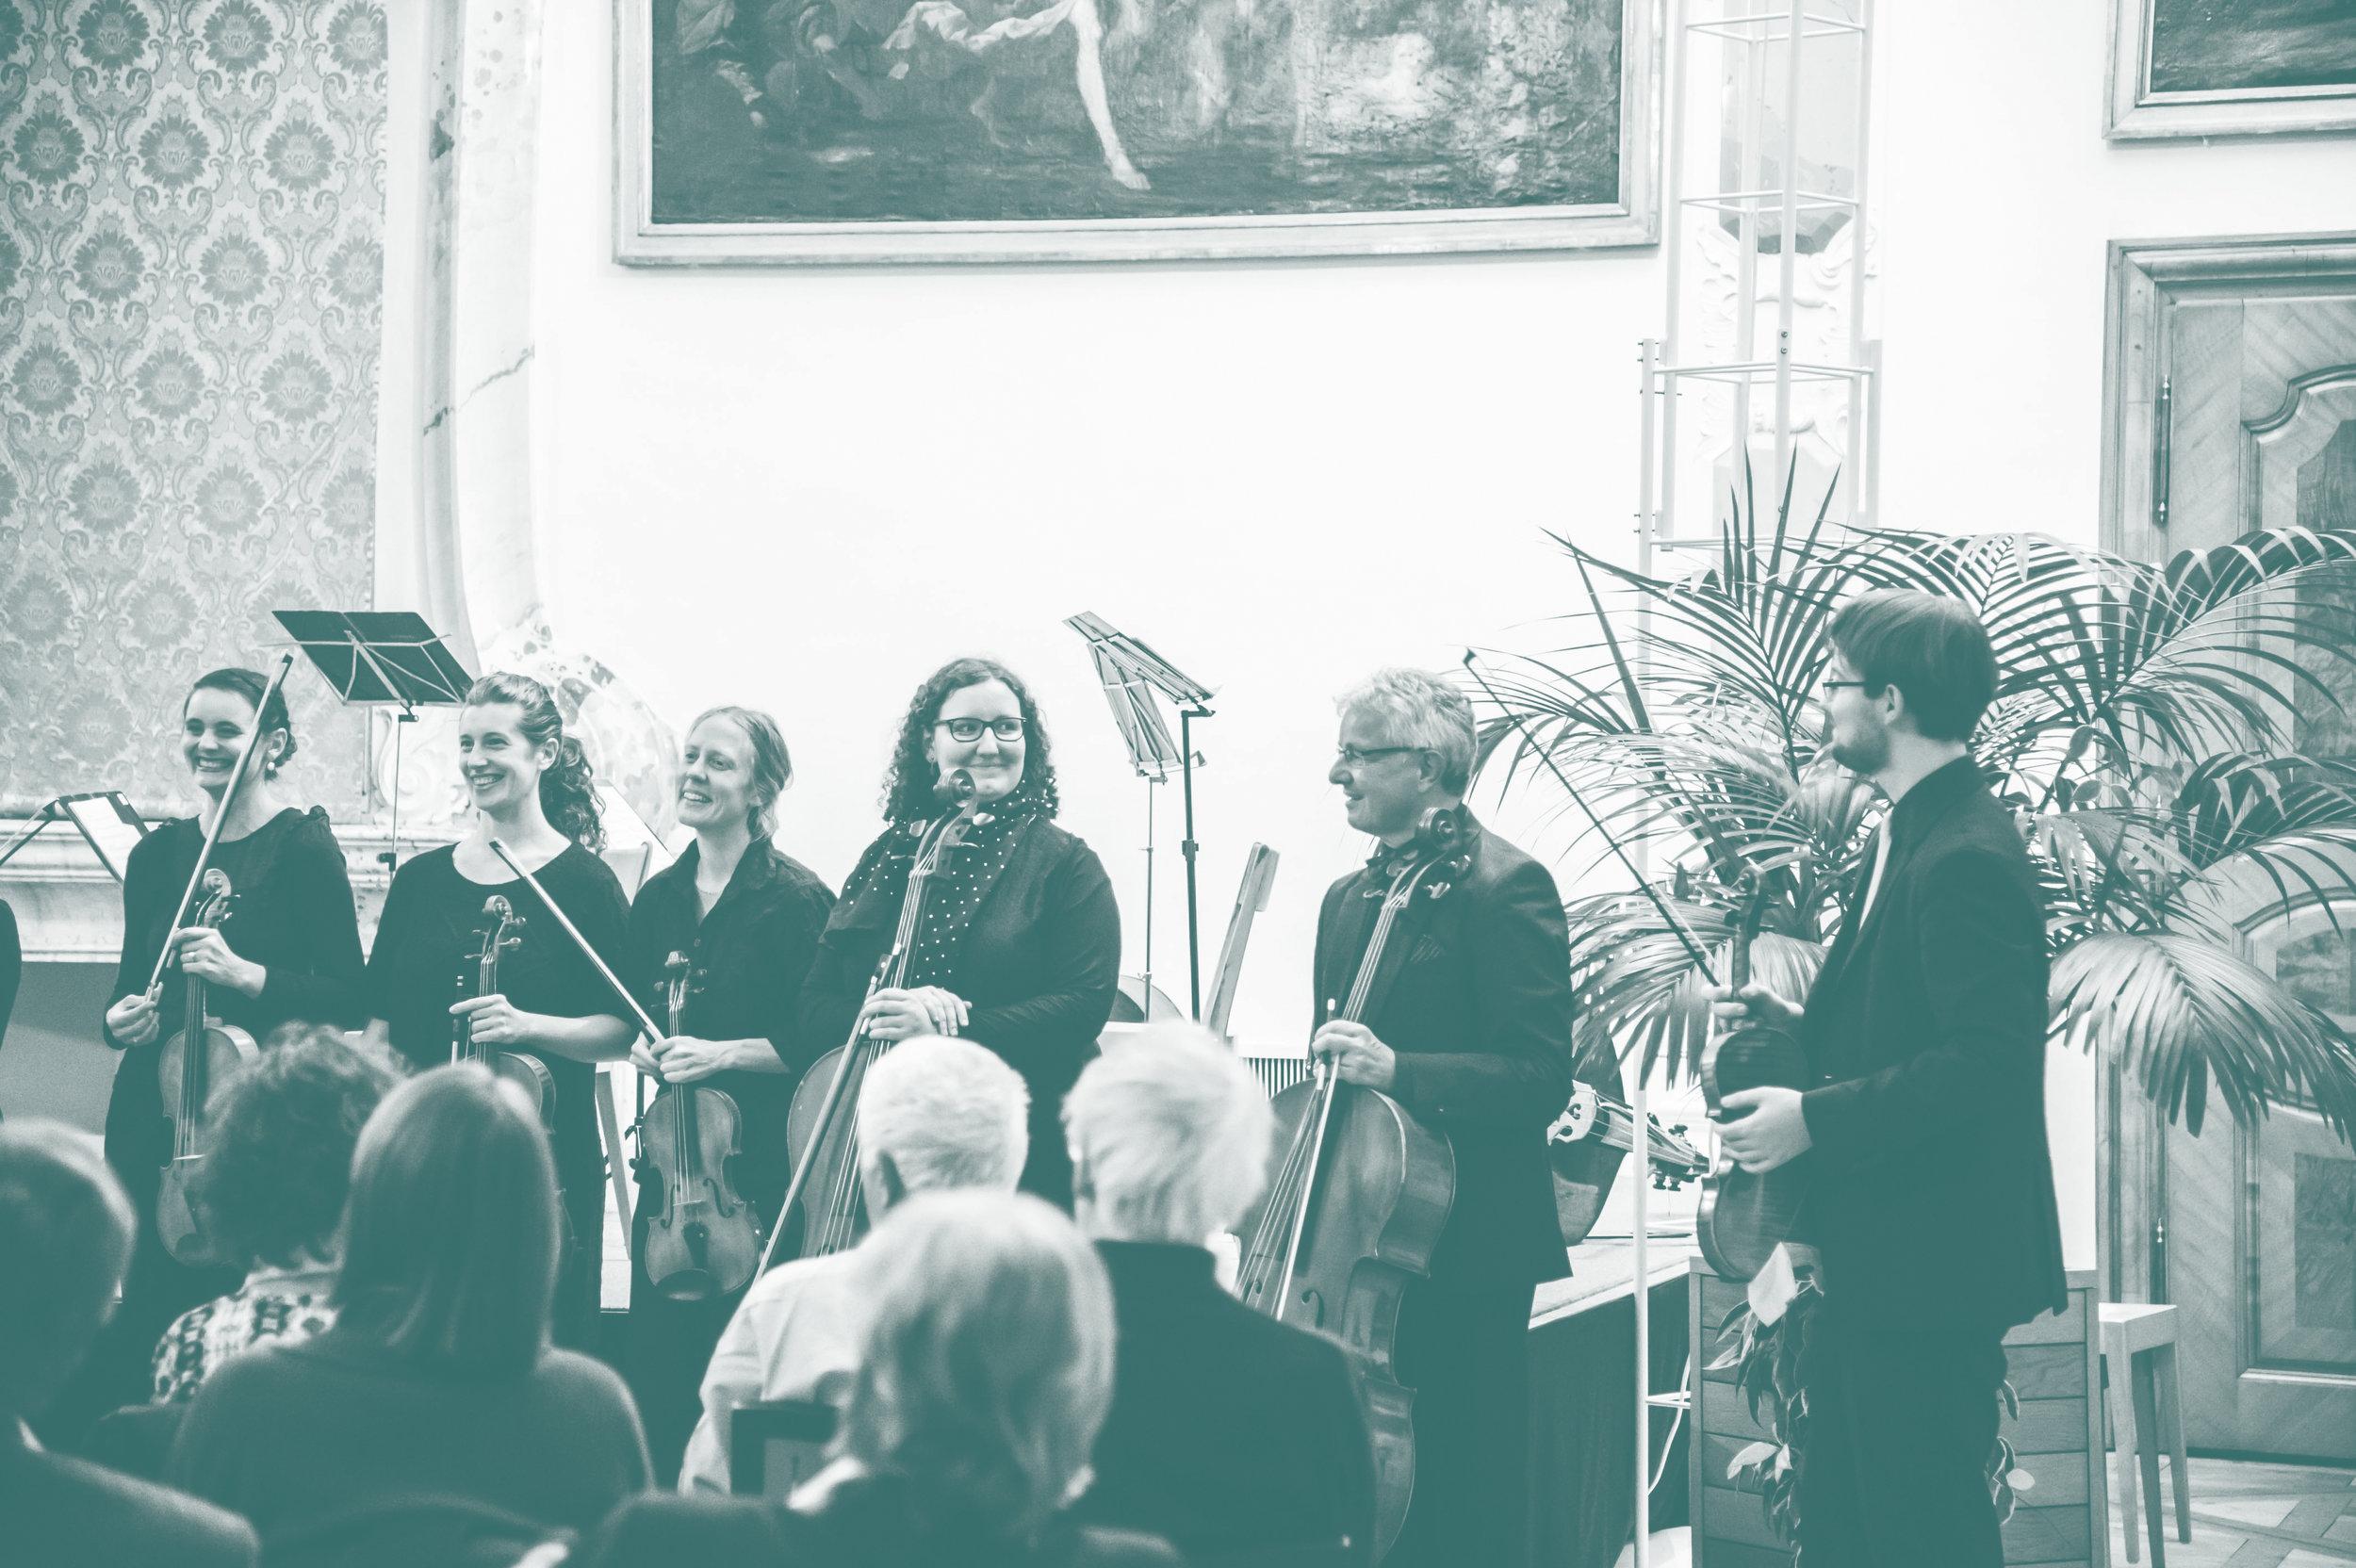 17_09_Herbstkonzert Kammerorchester Huttwil_BO-74_sw.jpg